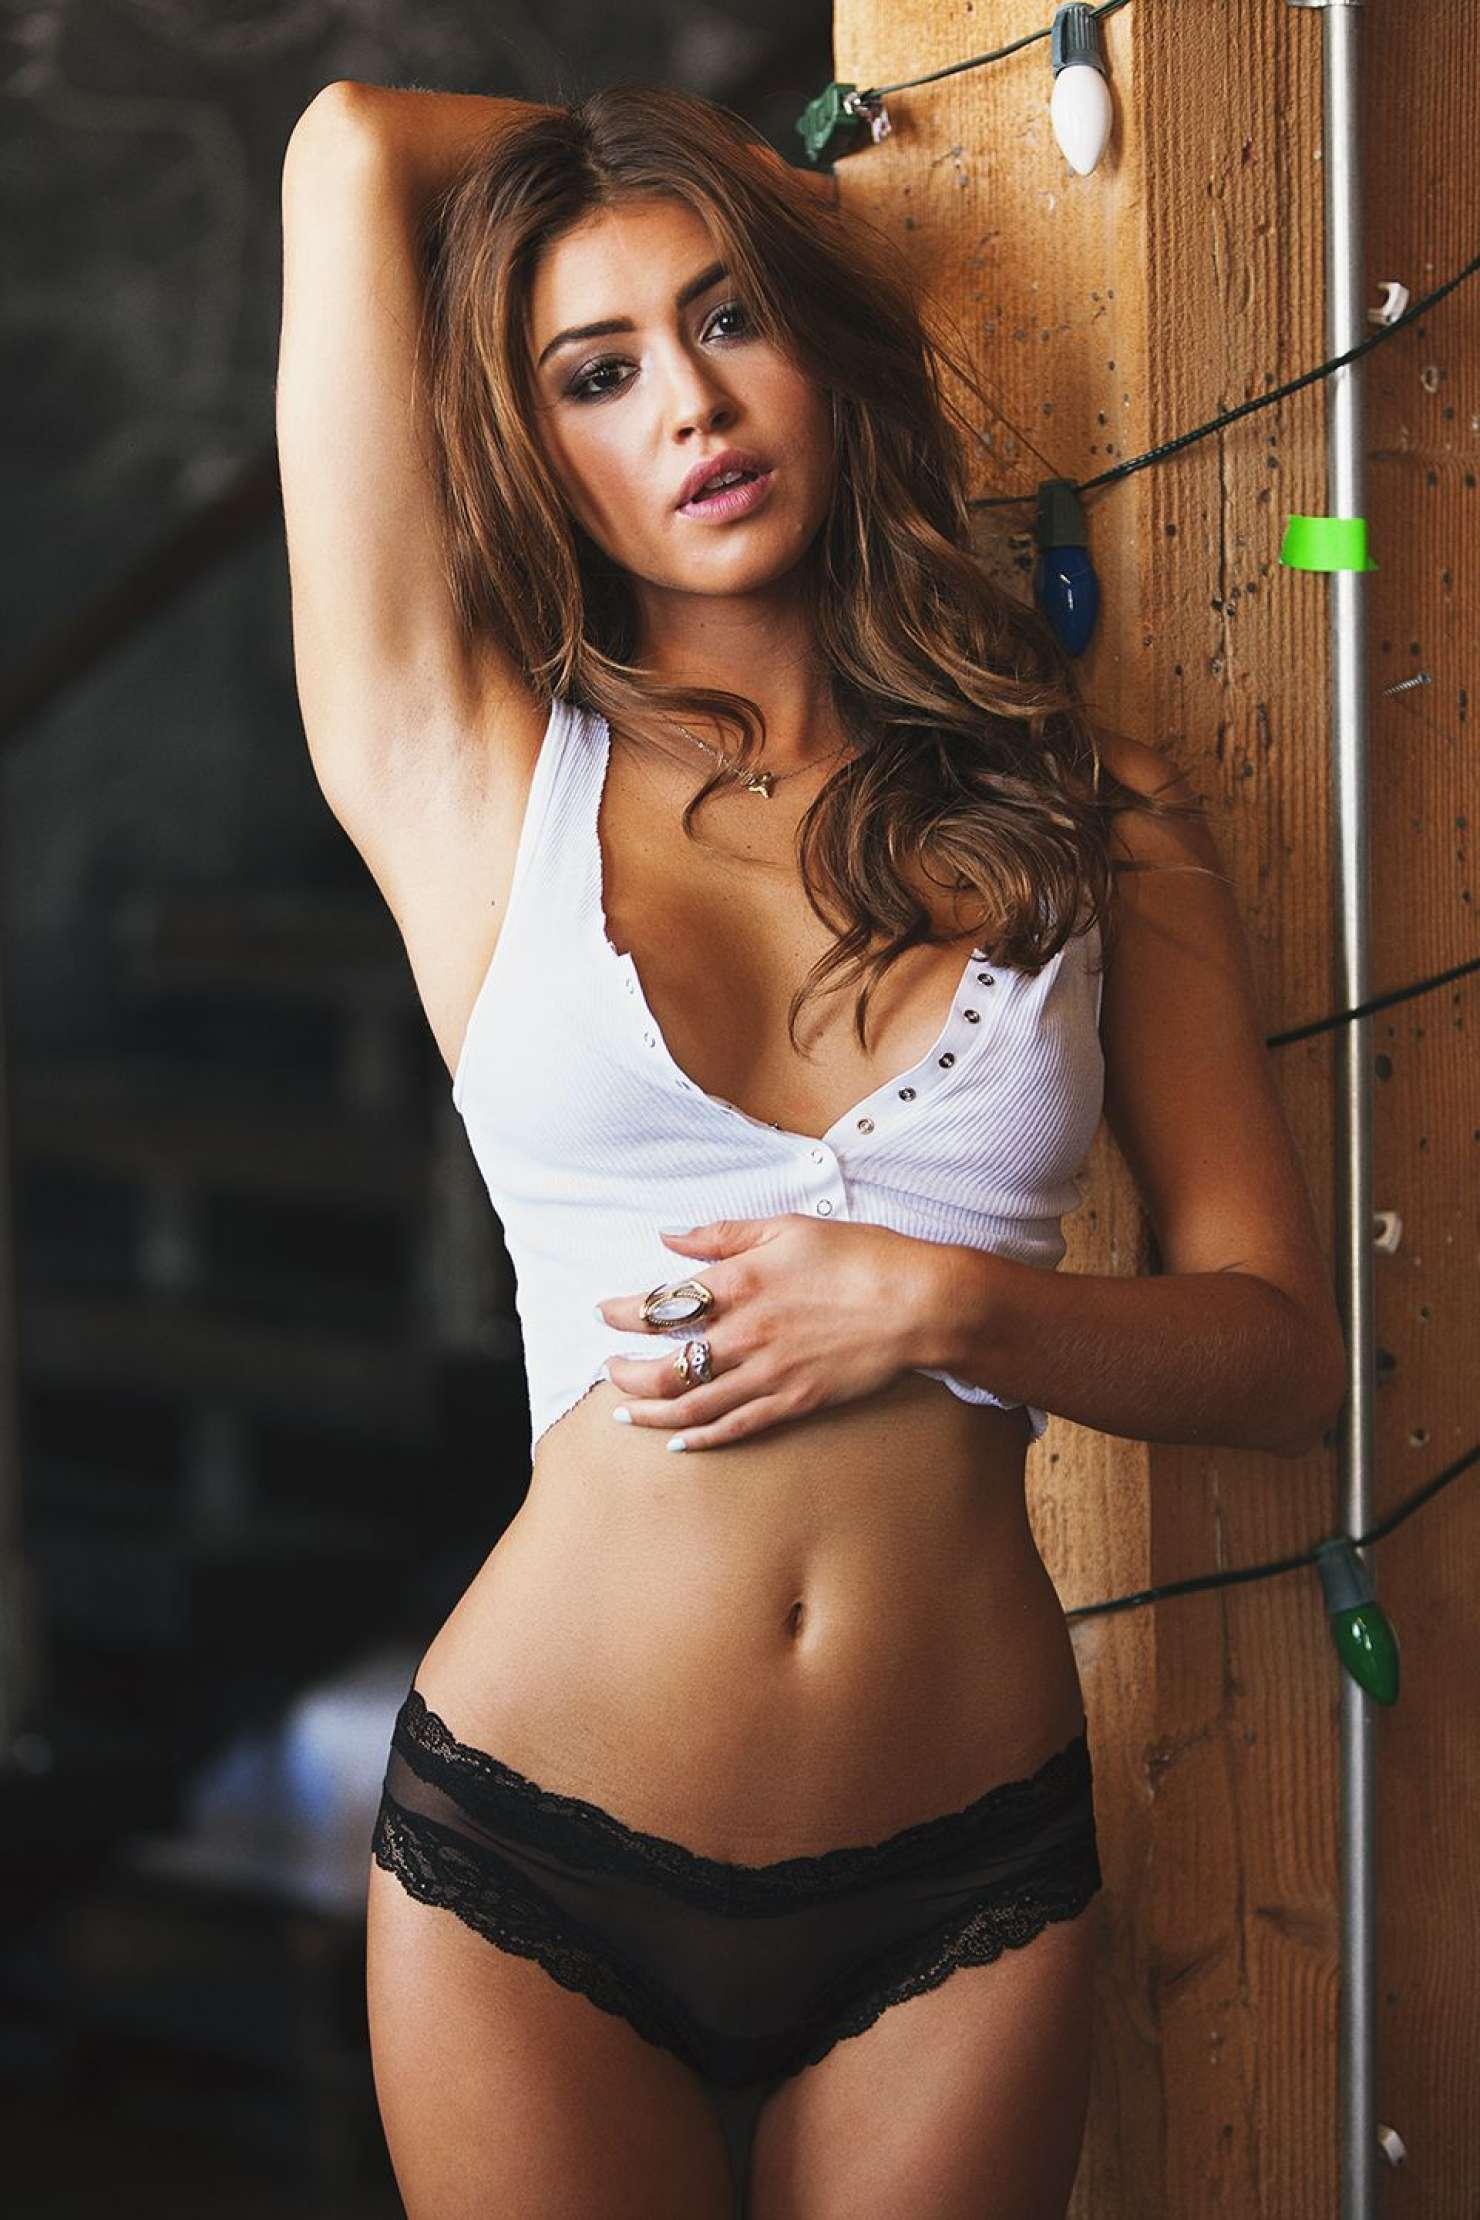 model jehane gigi pretty sexy attractive fashion hair adult lady portrait brunette